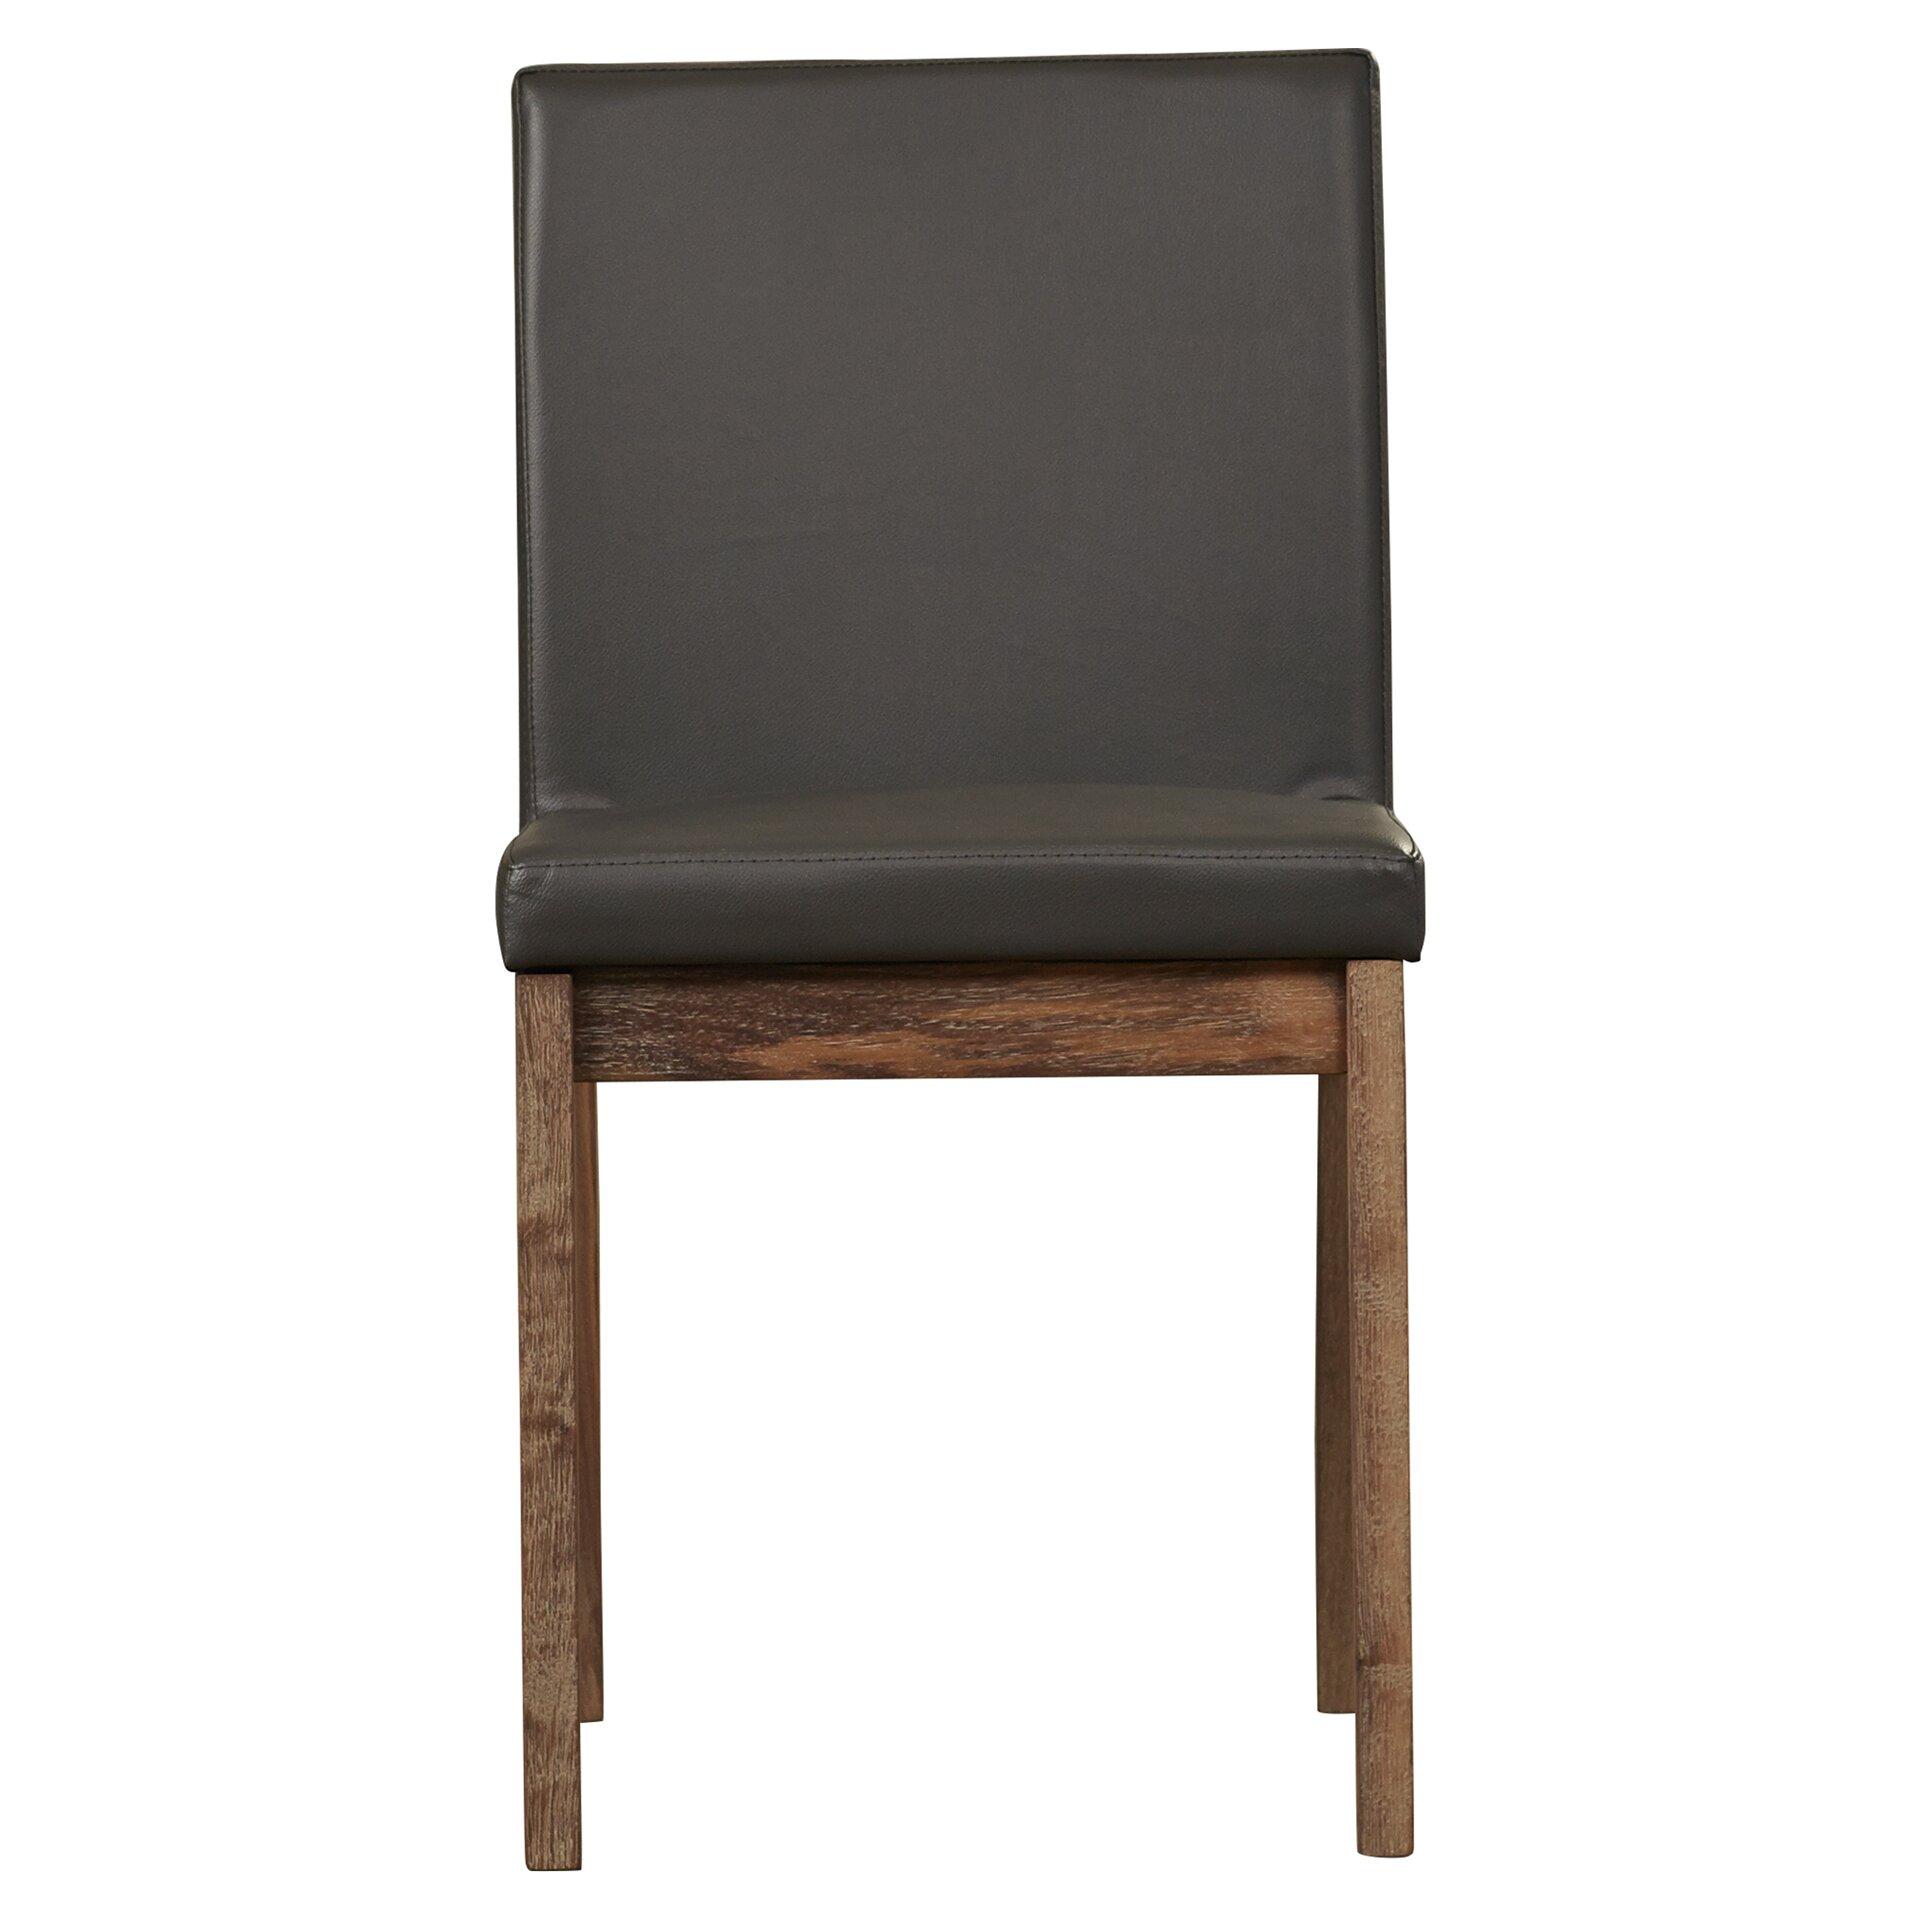 Brayden Studio Currie Side Chair Amp Reviews Wayfair